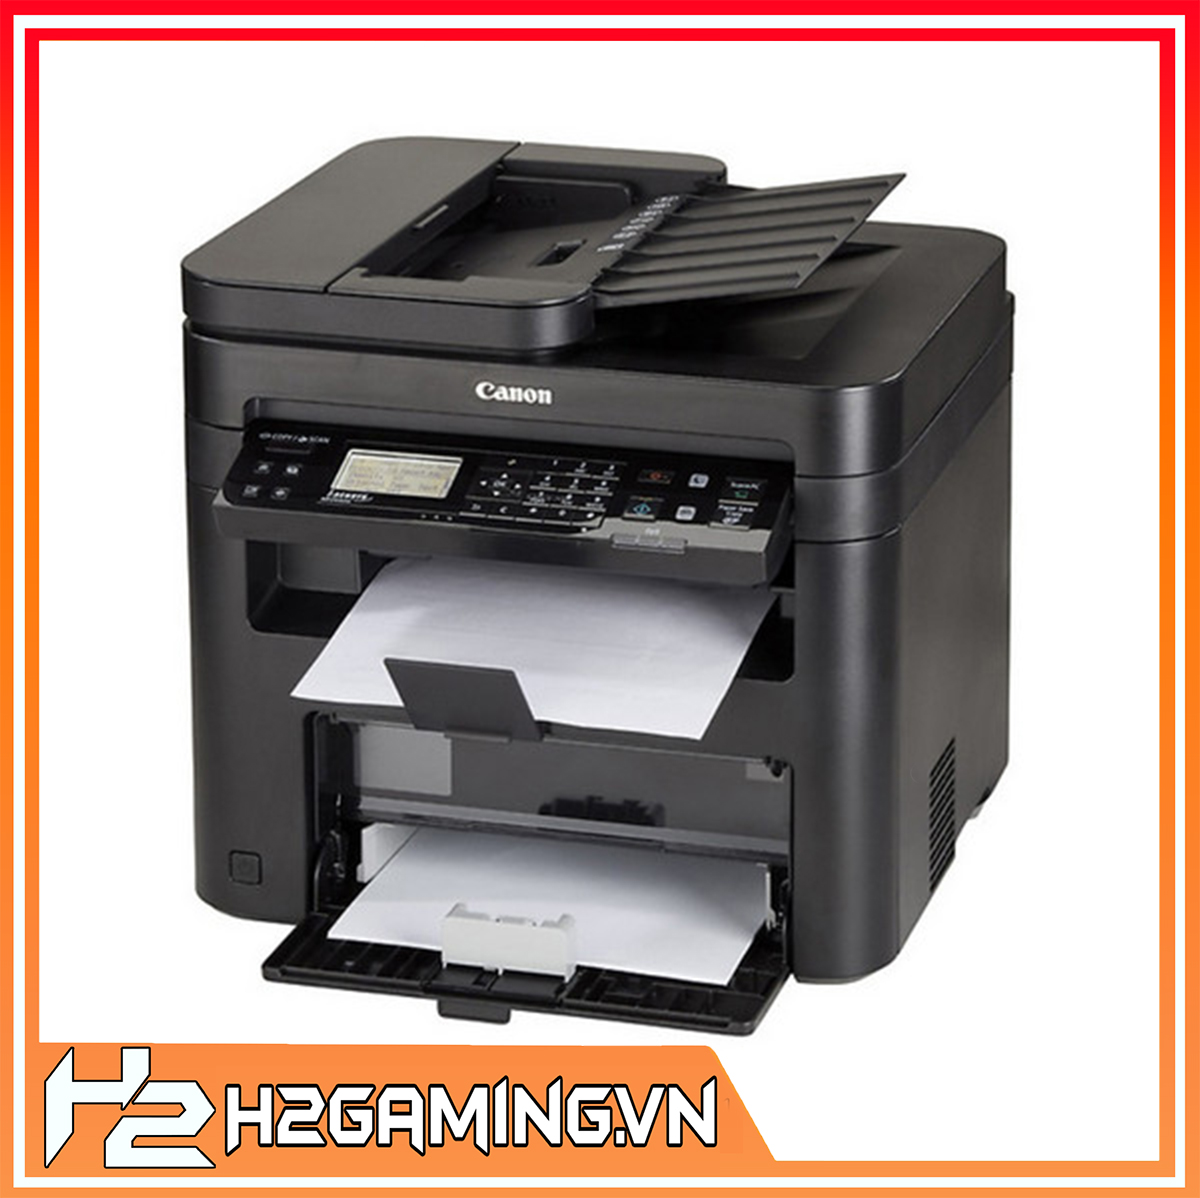 MF_237W_(Print_wifi_+_Copy_+_Scan_+_fax)